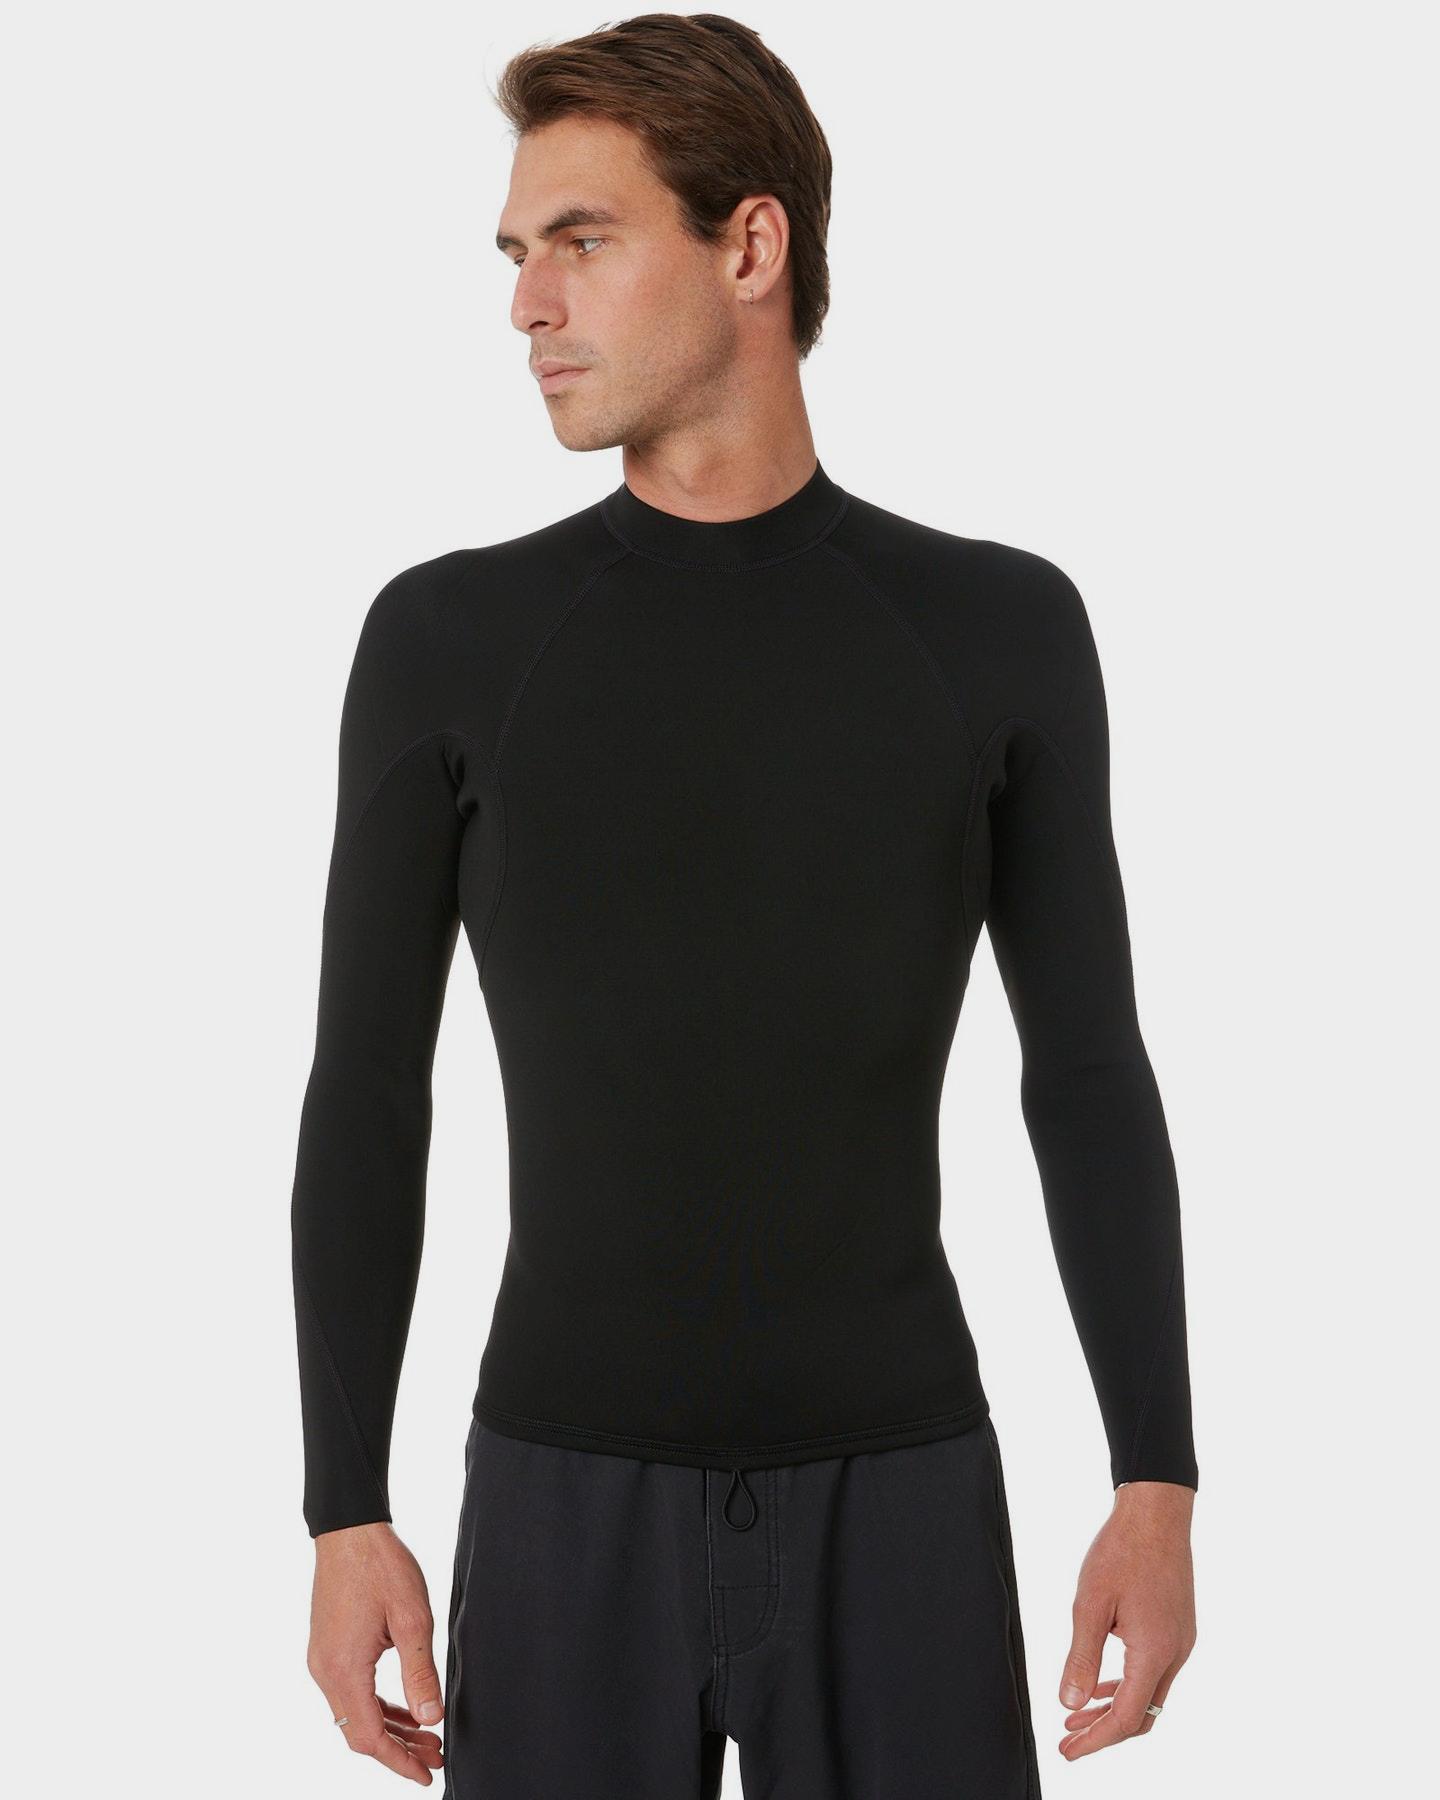 Project Blank Mens 2Mm High Performance Long Sleeve Vest Black